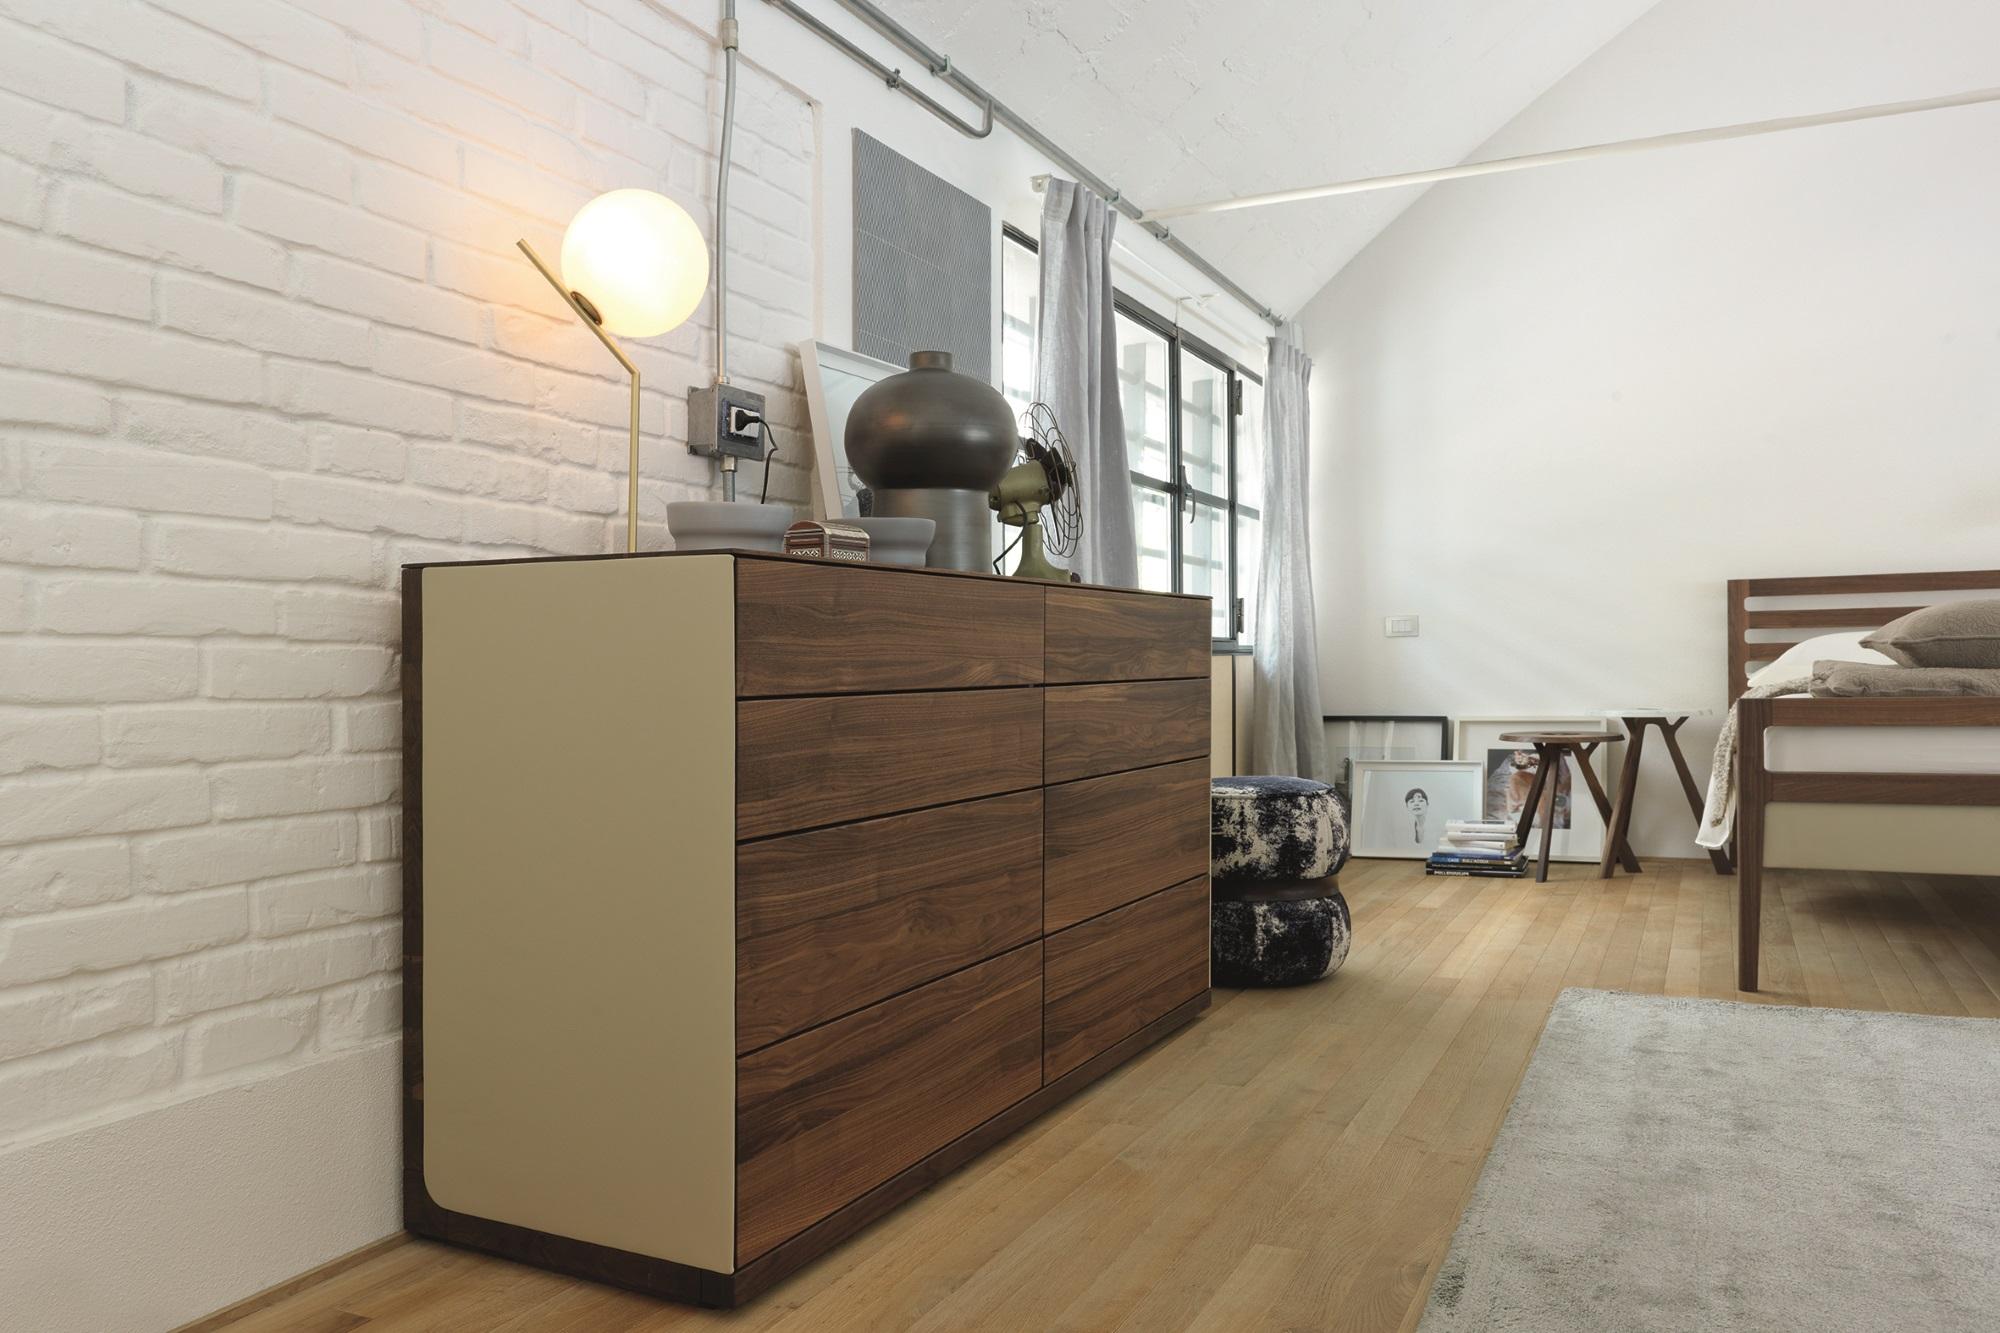 bett mylon biom bel bonn. Black Bedroom Furniture Sets. Home Design Ideas